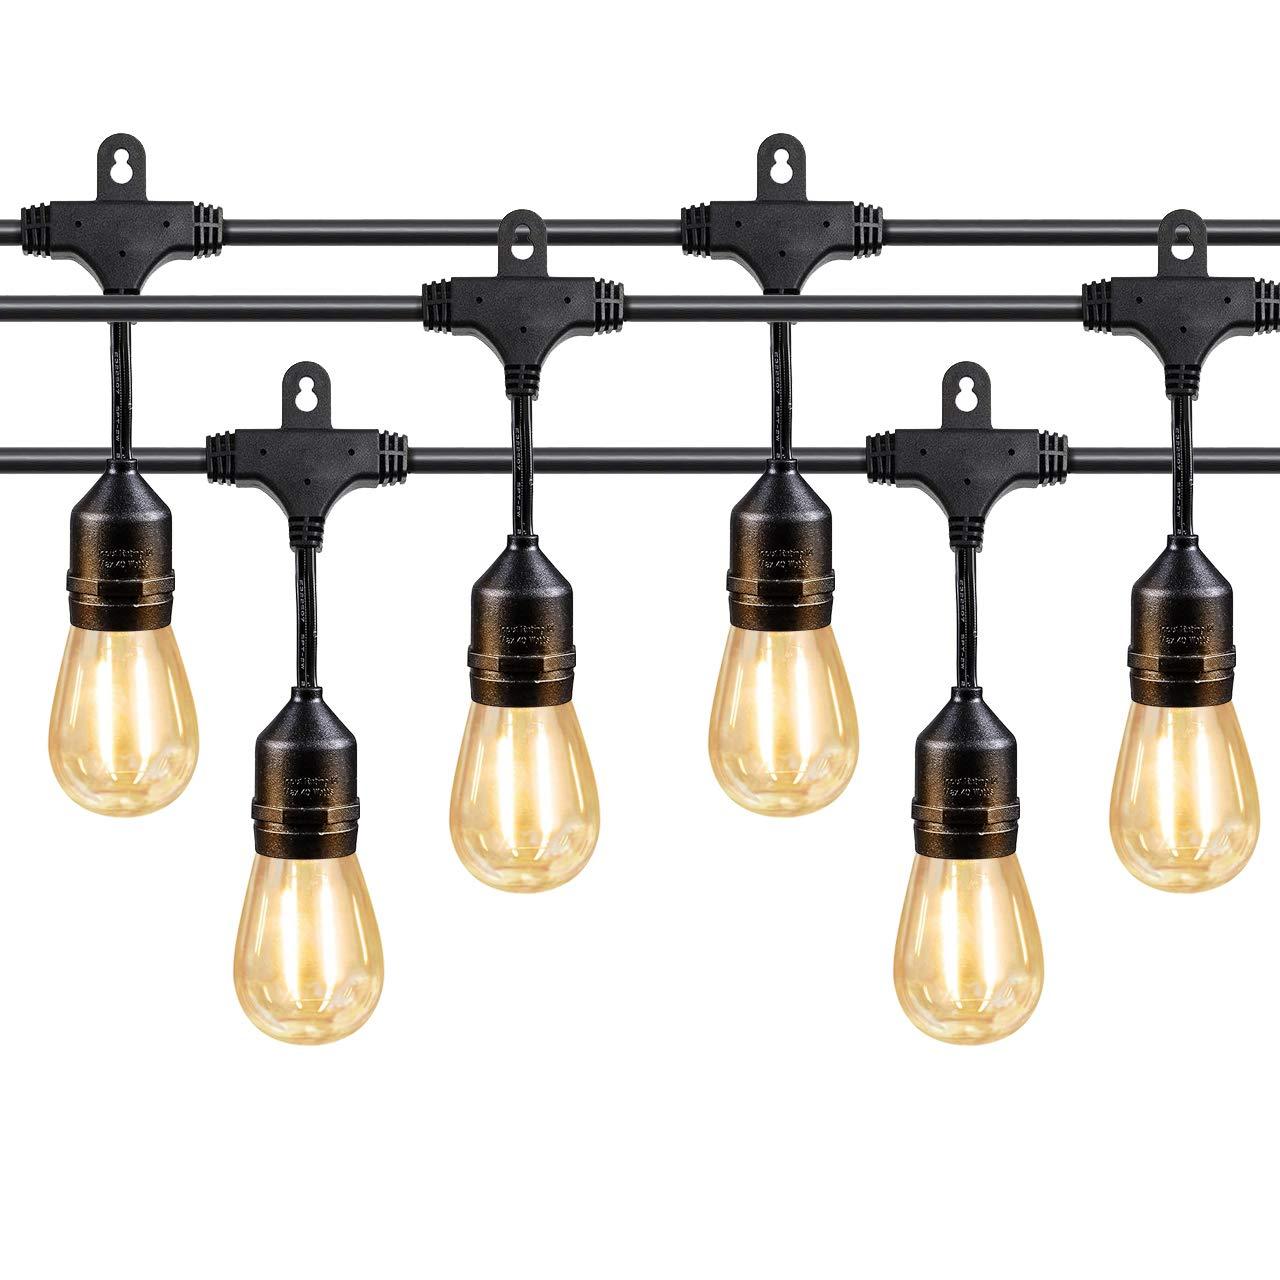 Teletrogy 48FT IP65 Weatherproof LED Outdoor String Lights UL Listed Vintage Hanging Edison Bulbs Heavy Duty Commercial Grade Patio/Gazebo Lights 16 x S14 2W LED Bulbs –Black